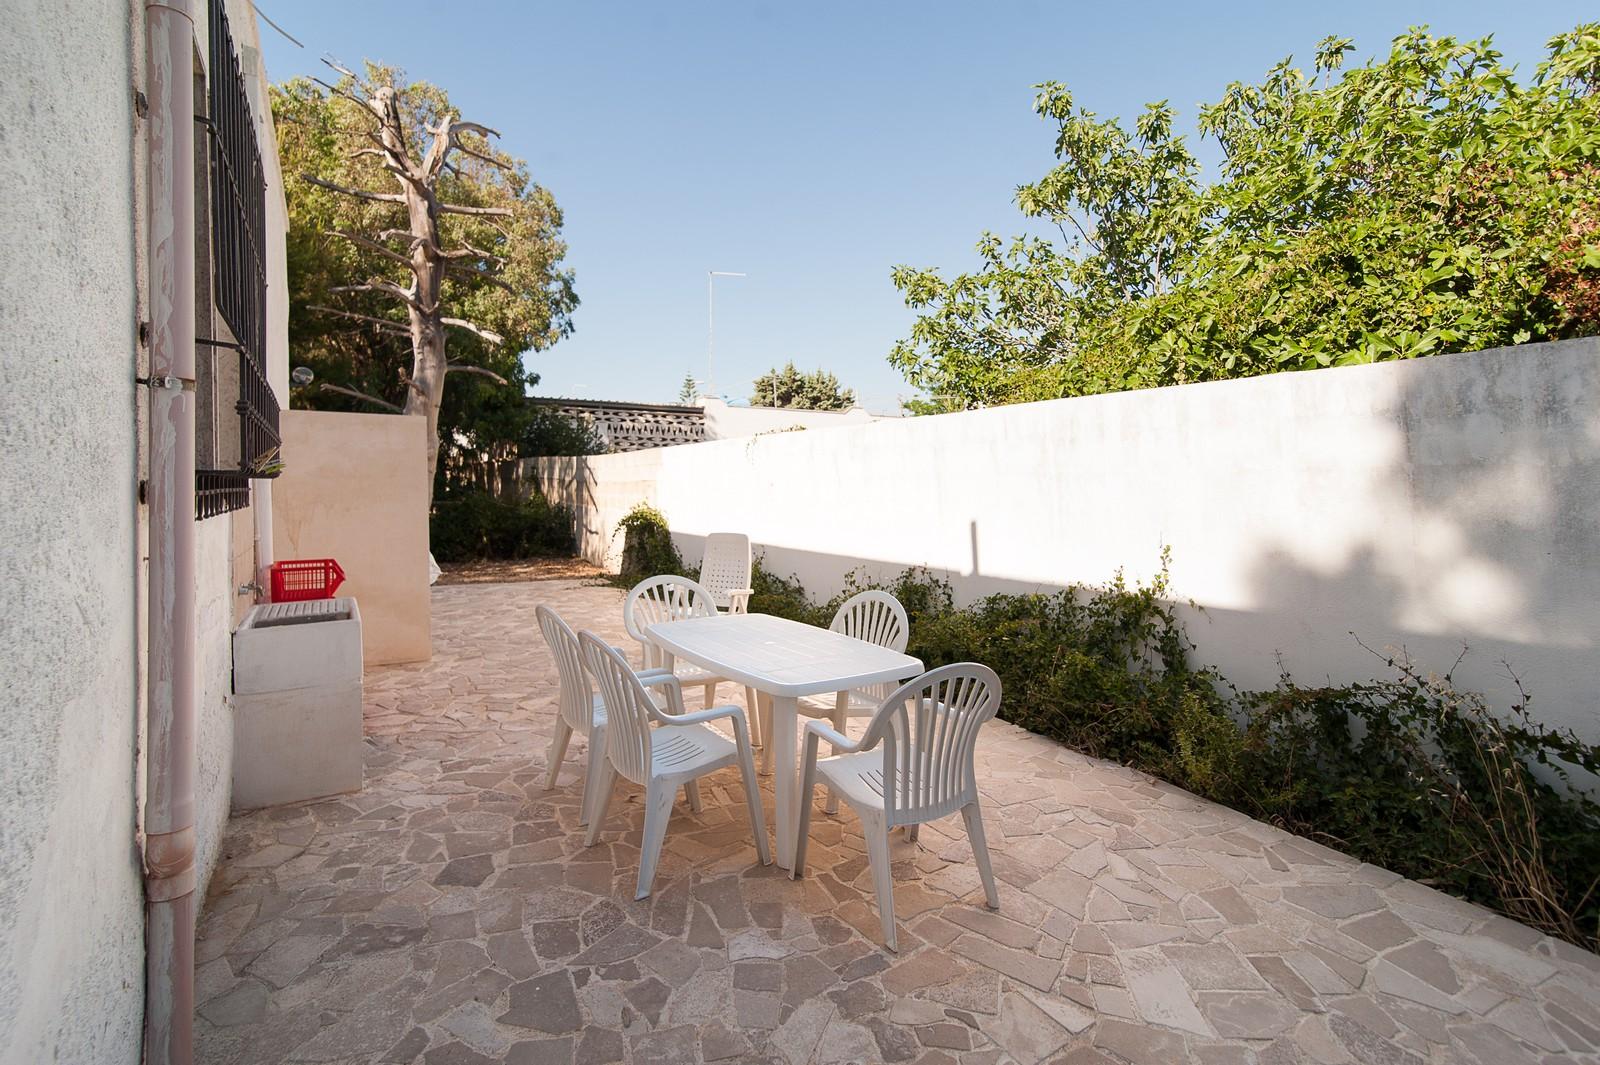 Ferienhaus Villa Mariposa  n. 2-150 meters from the beach (2354066), Porto Cesareo, Lecce, Apulien, Italien, Bild 15